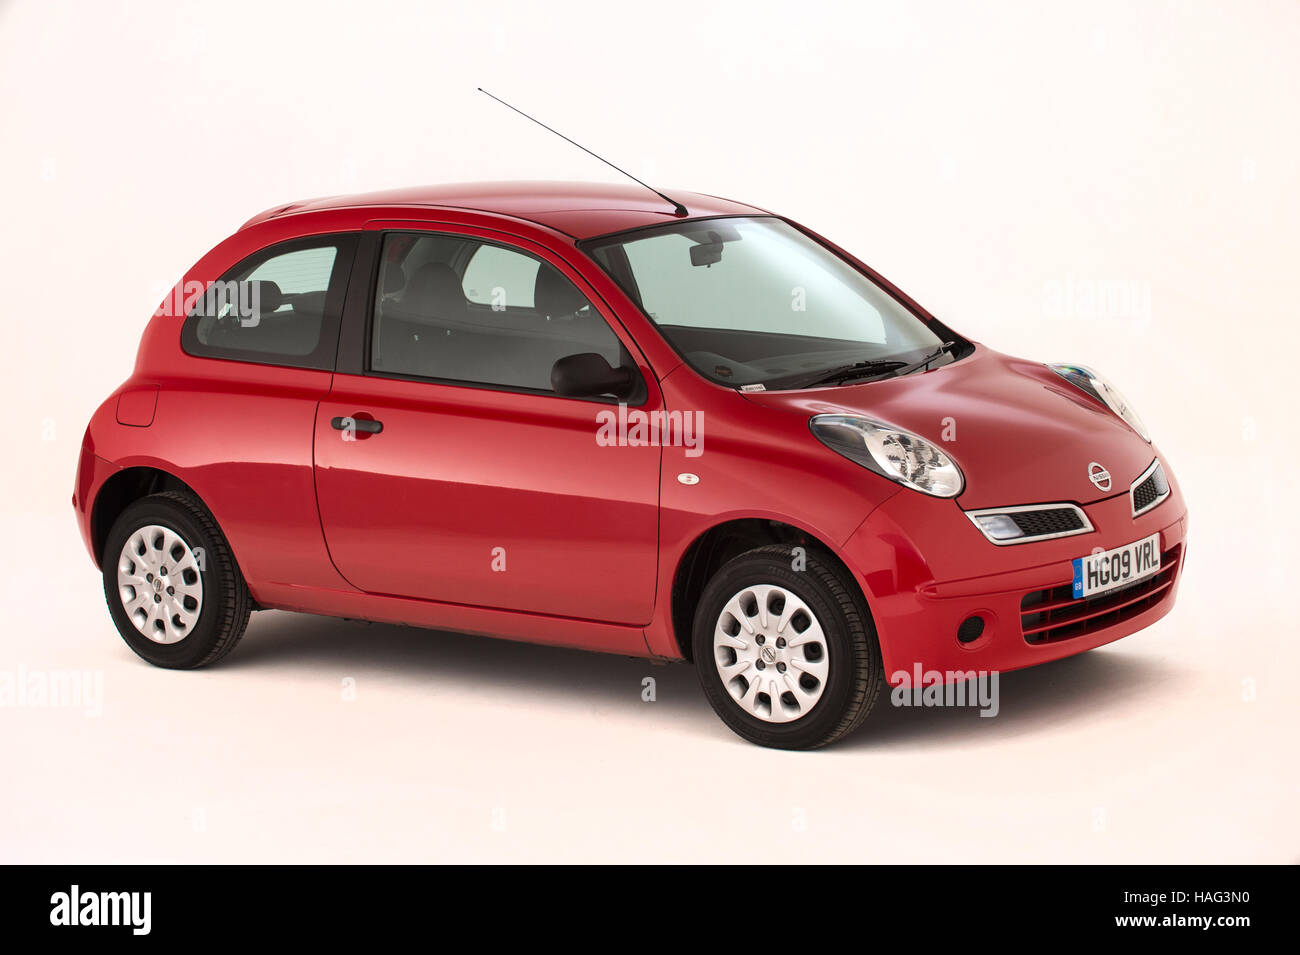 2009 Nissan Micra - Stock Image